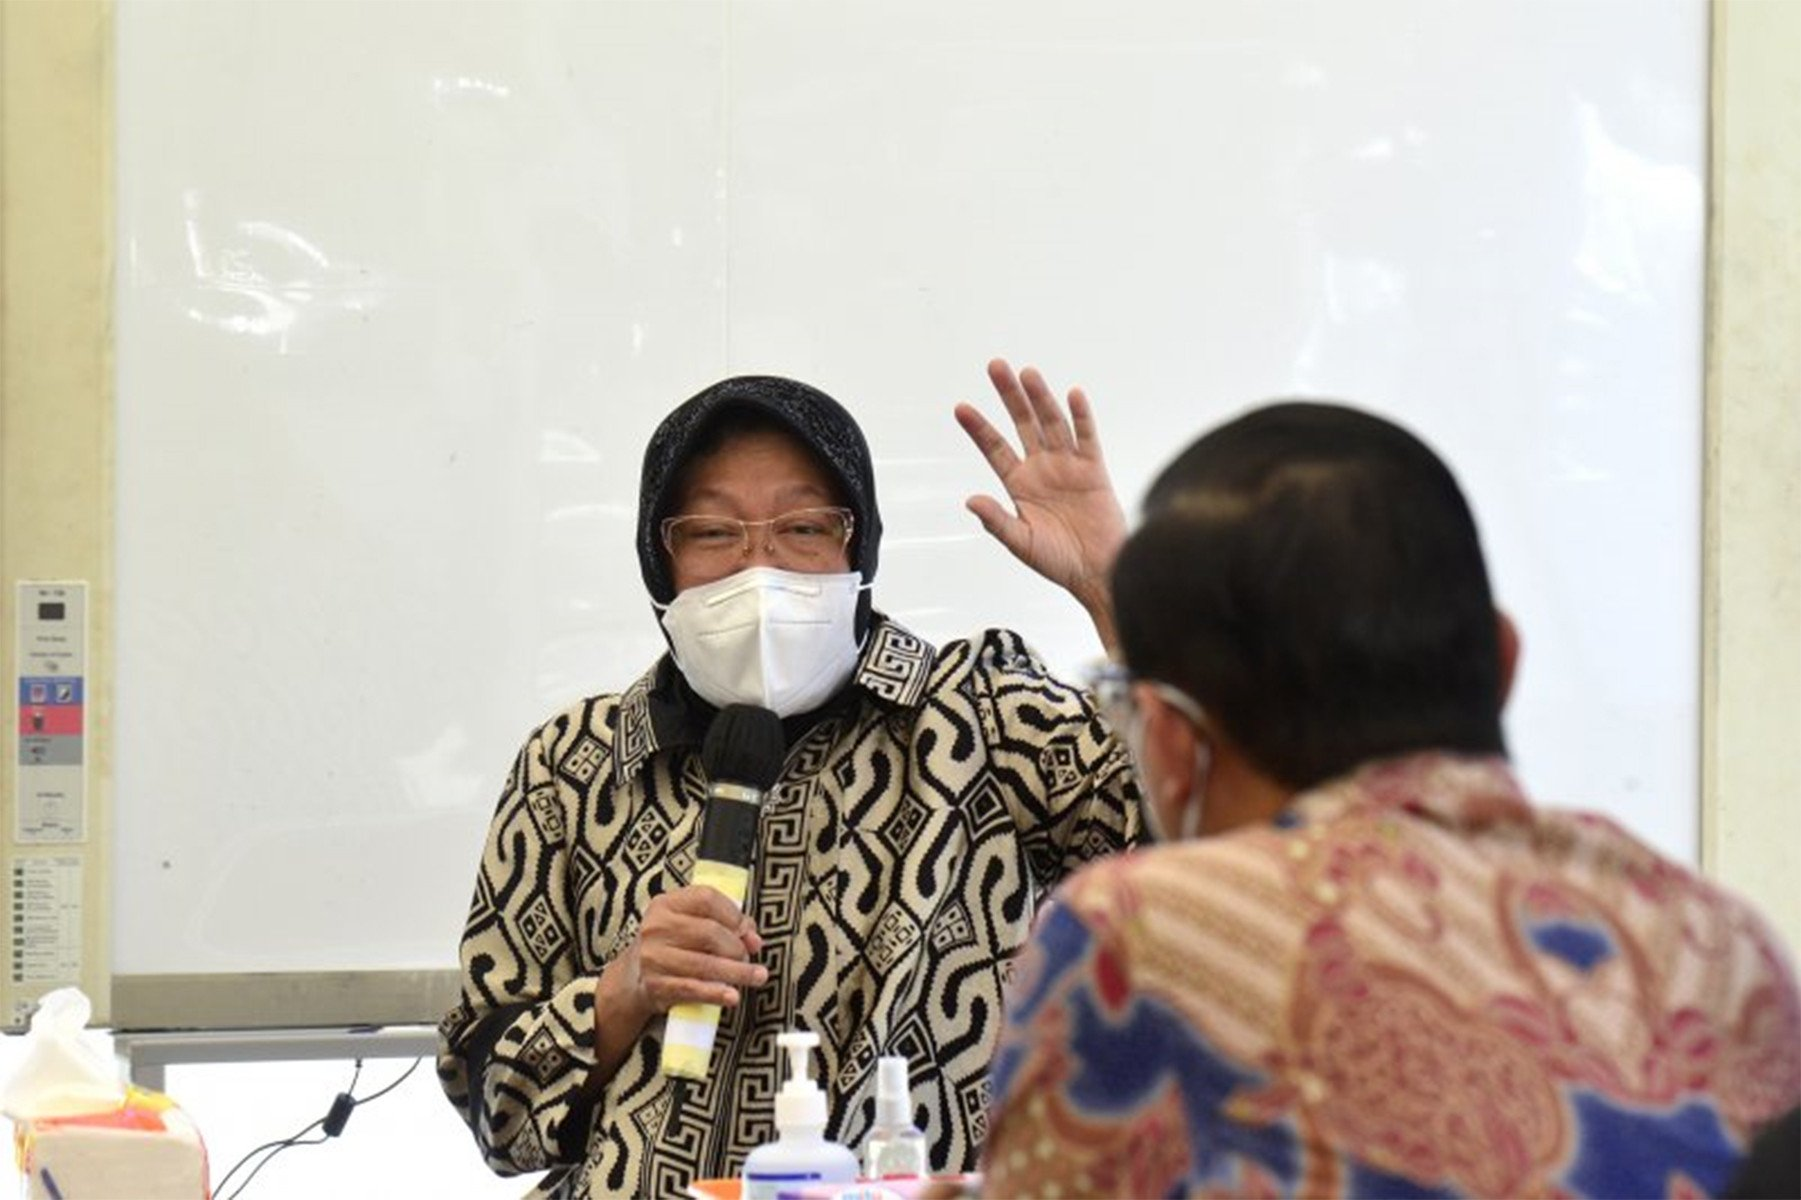 Pilkada Surabaya Memanas, Ada yang Pengin Hancurkan Risma Sekarang Juga - JPNN.com